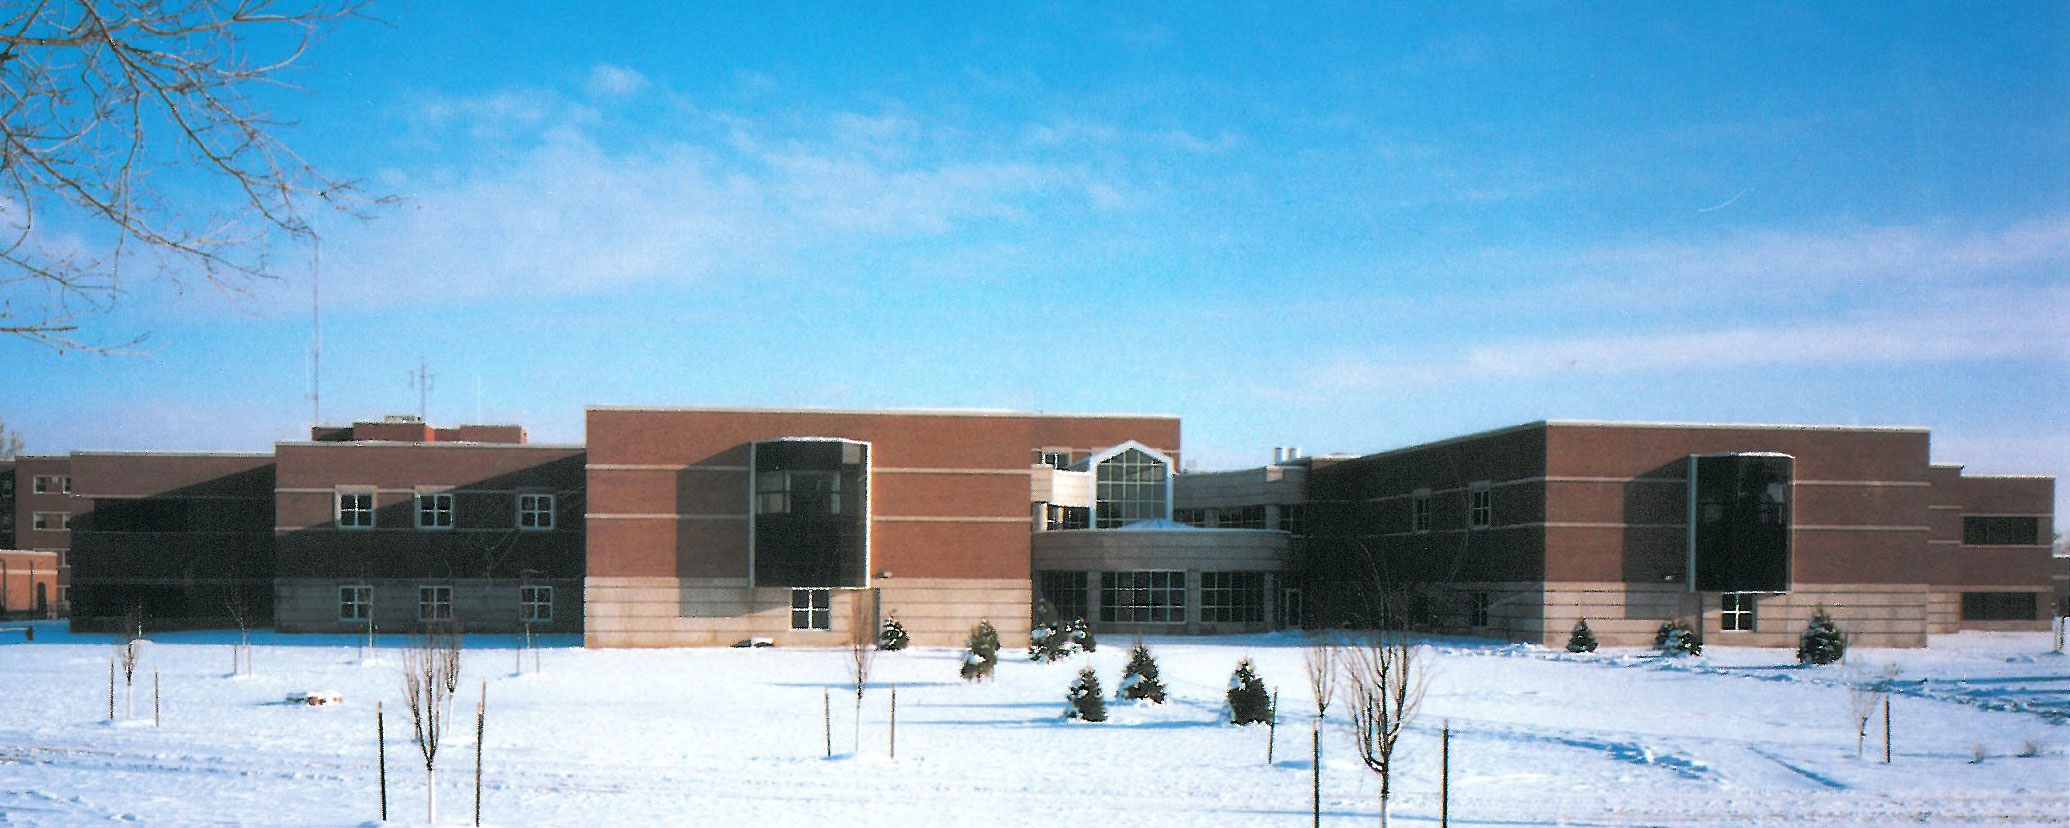 VA Geropsychiatric Facility Marion, IN | Caddell Construction